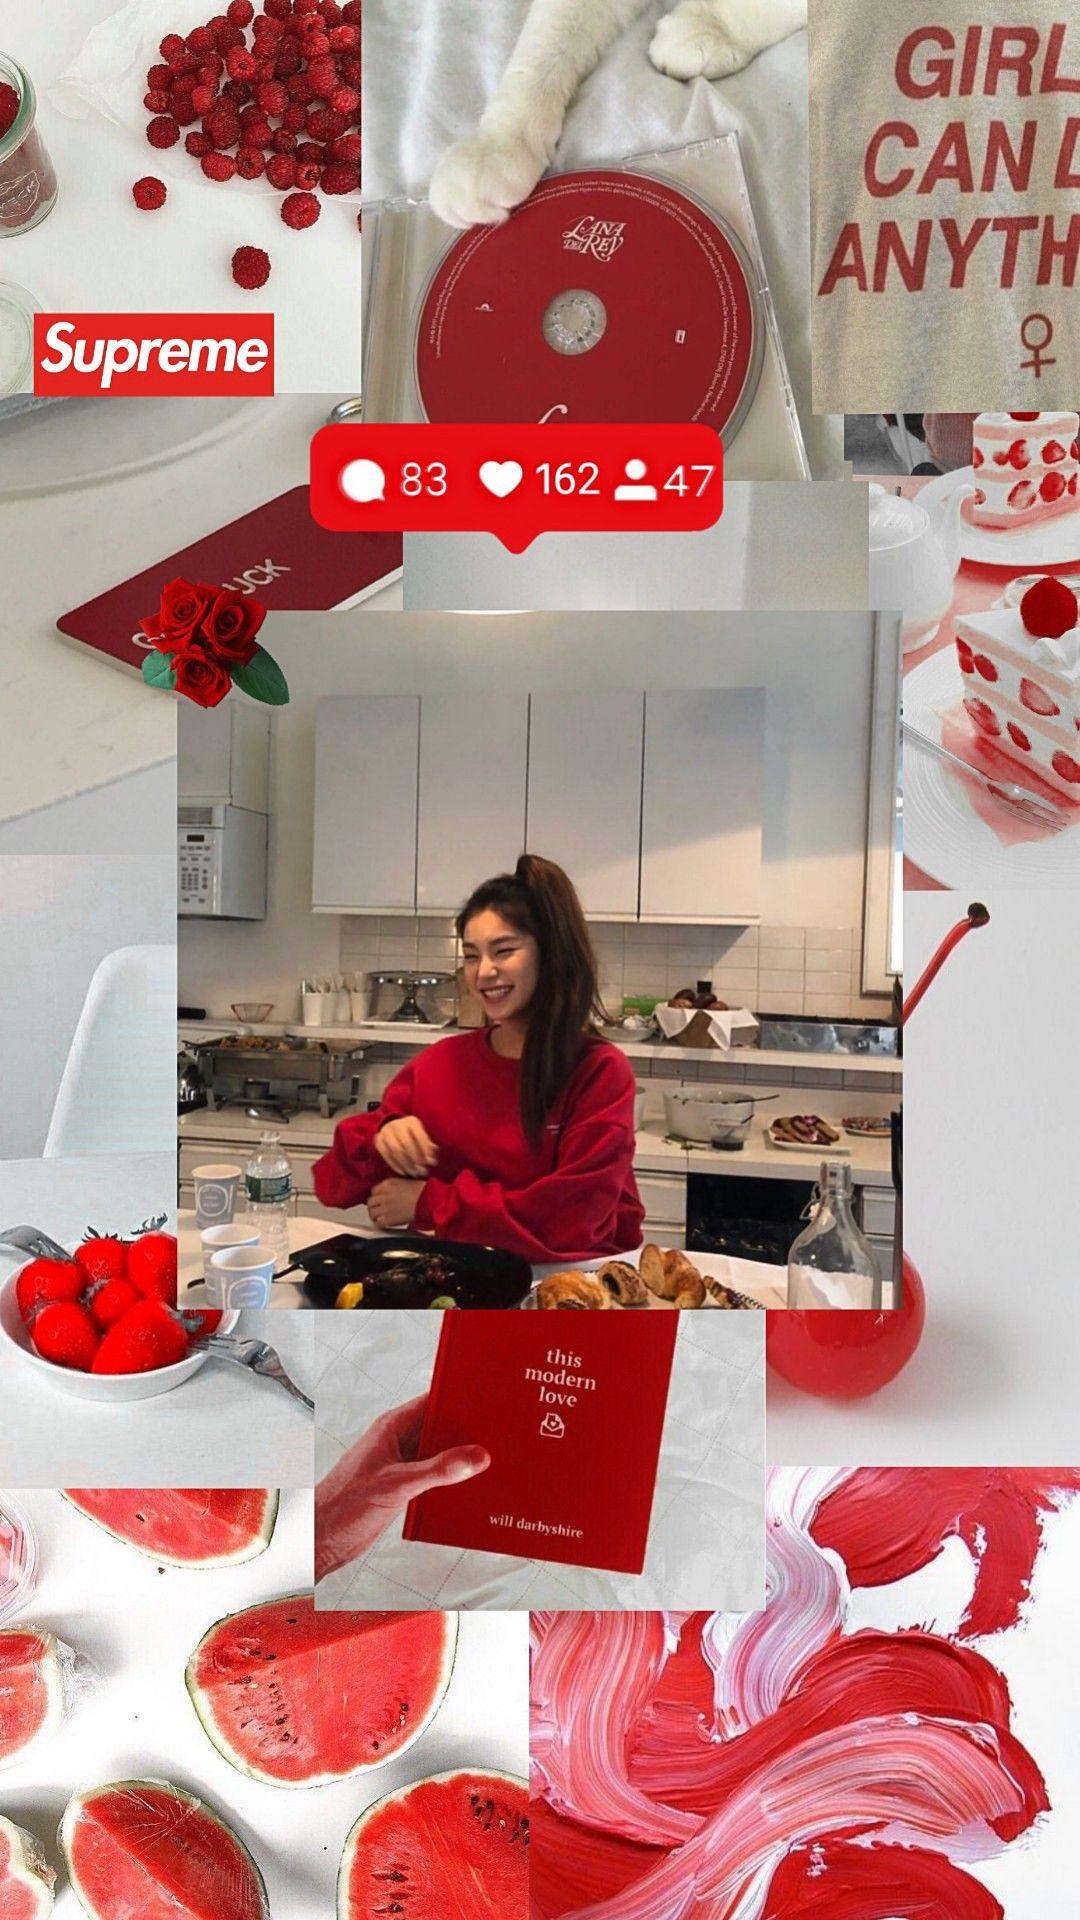 Mandys Gambar Merah